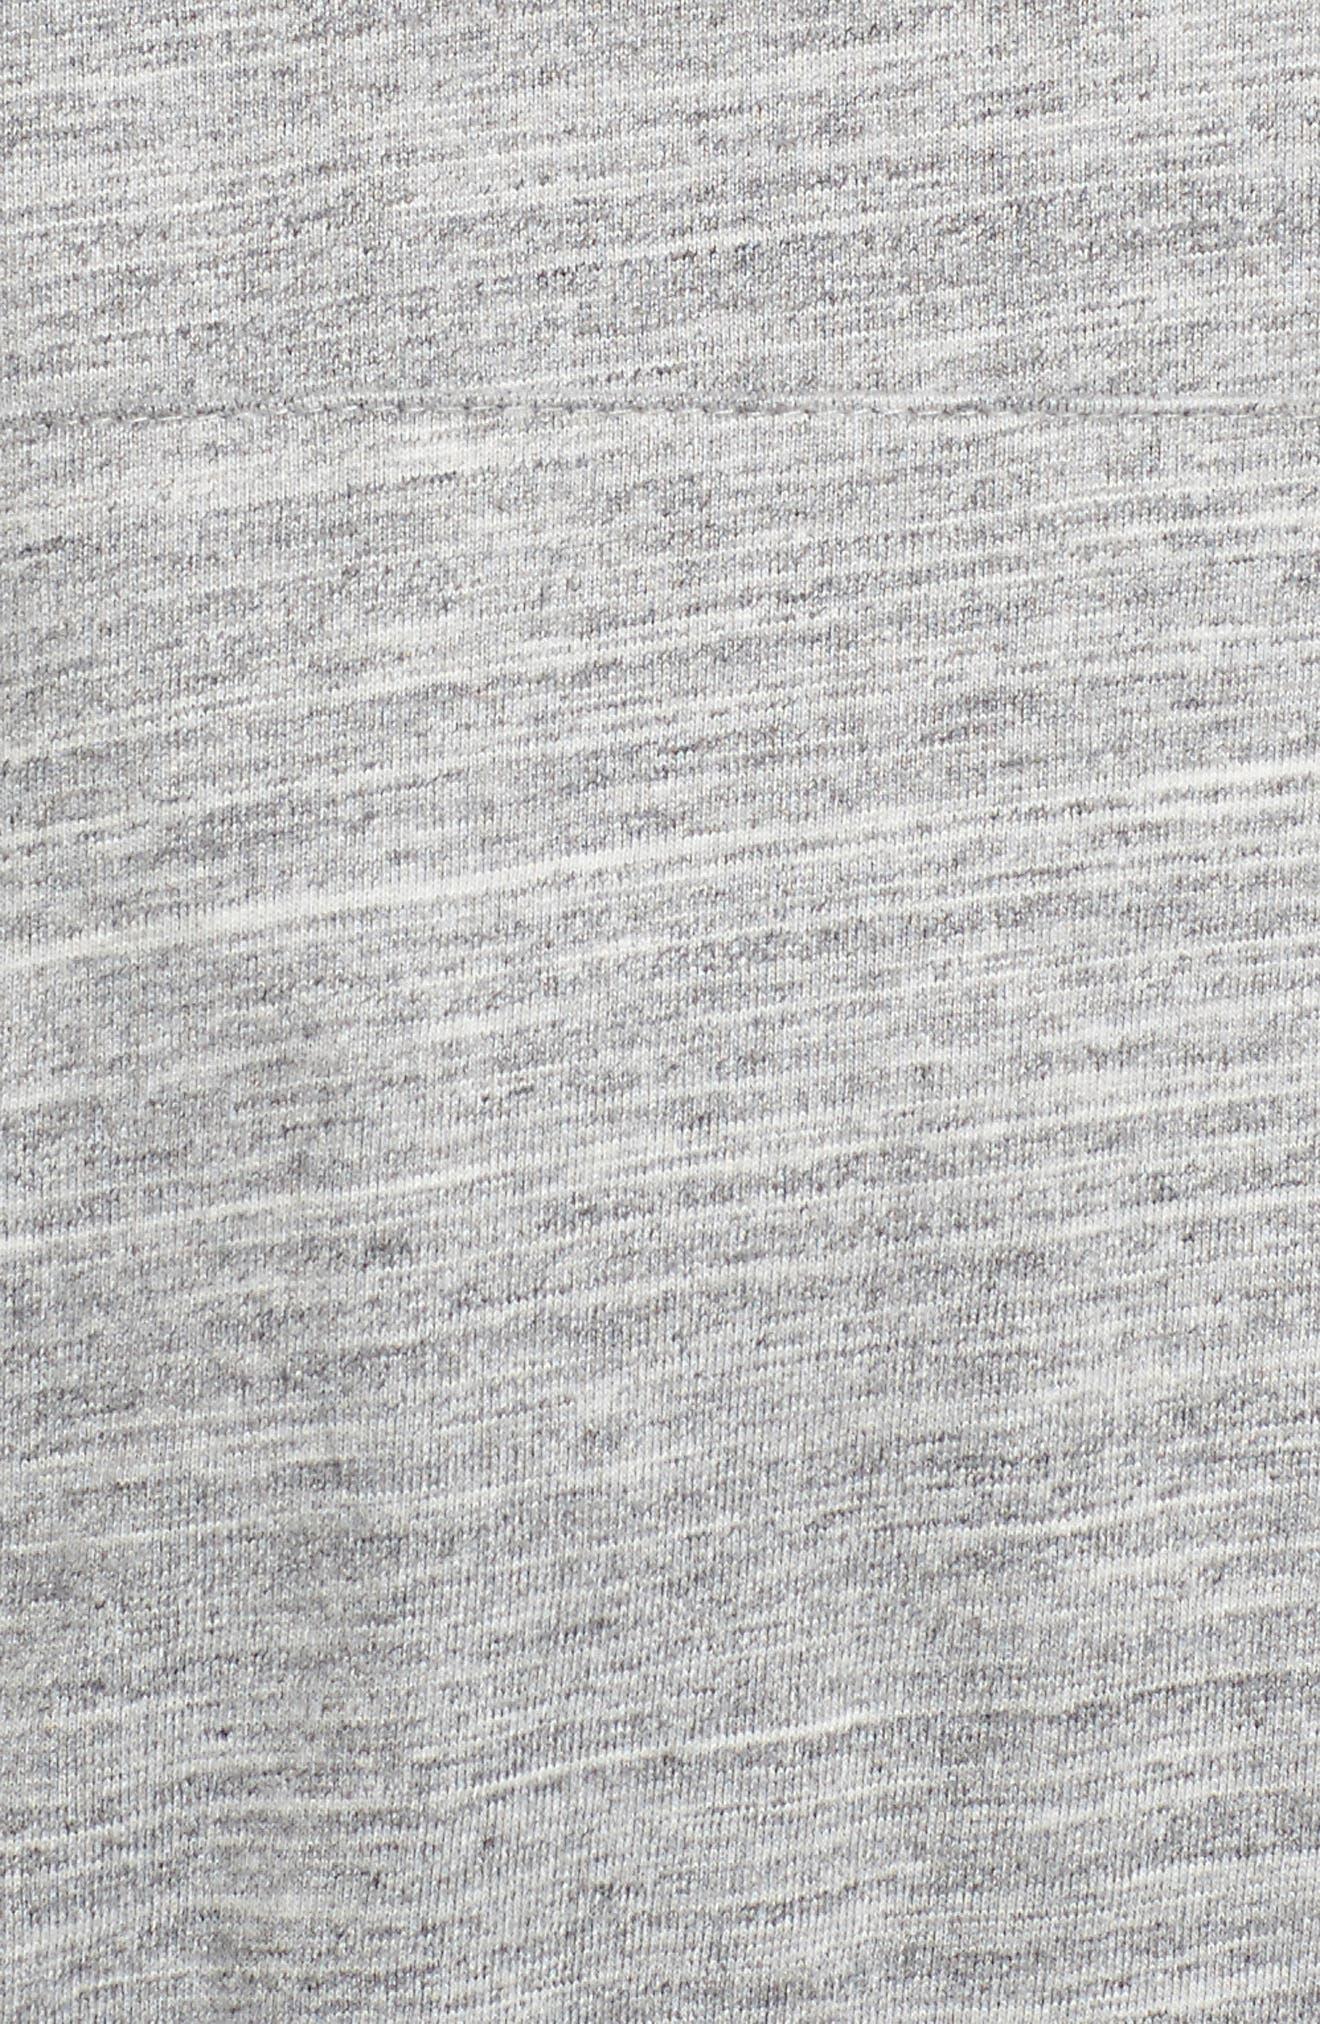 Revolve - Chicago Bears Hoodie,                             Alternate thumbnail 5, color,                             Space Dye Grey